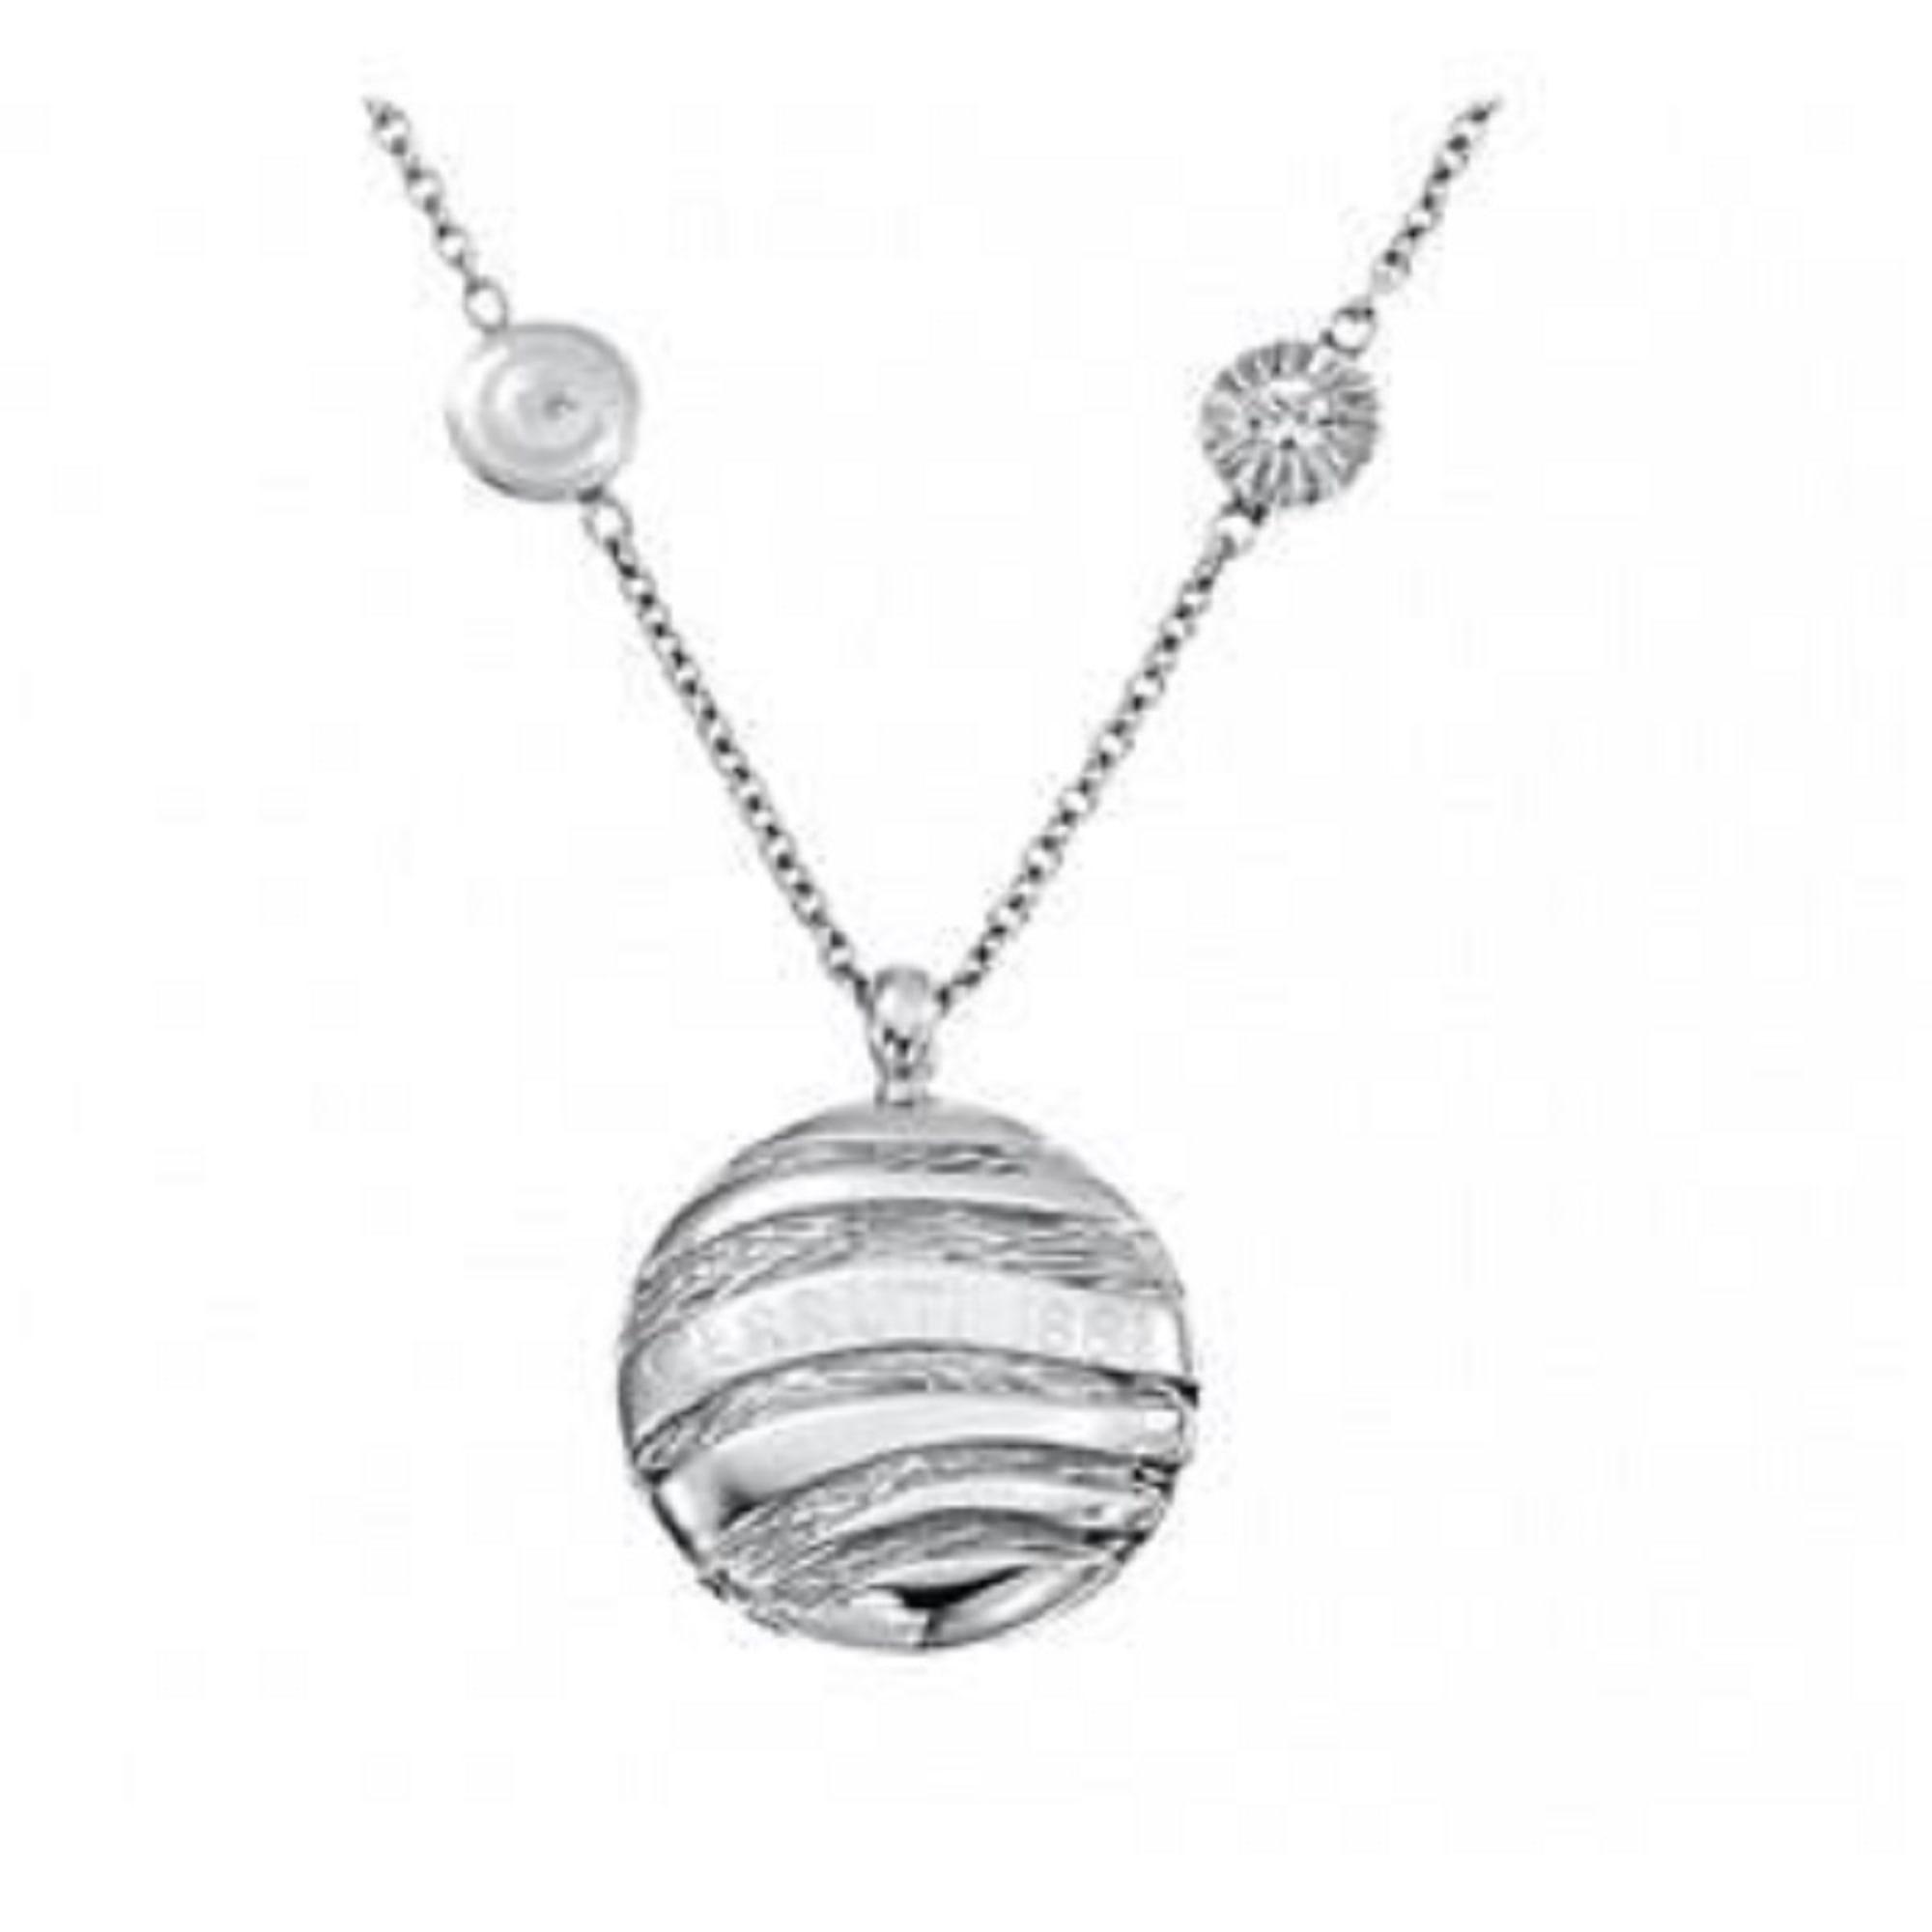 5a2f4aa49b Necklace CERRUTI 1881 silver - 3182859